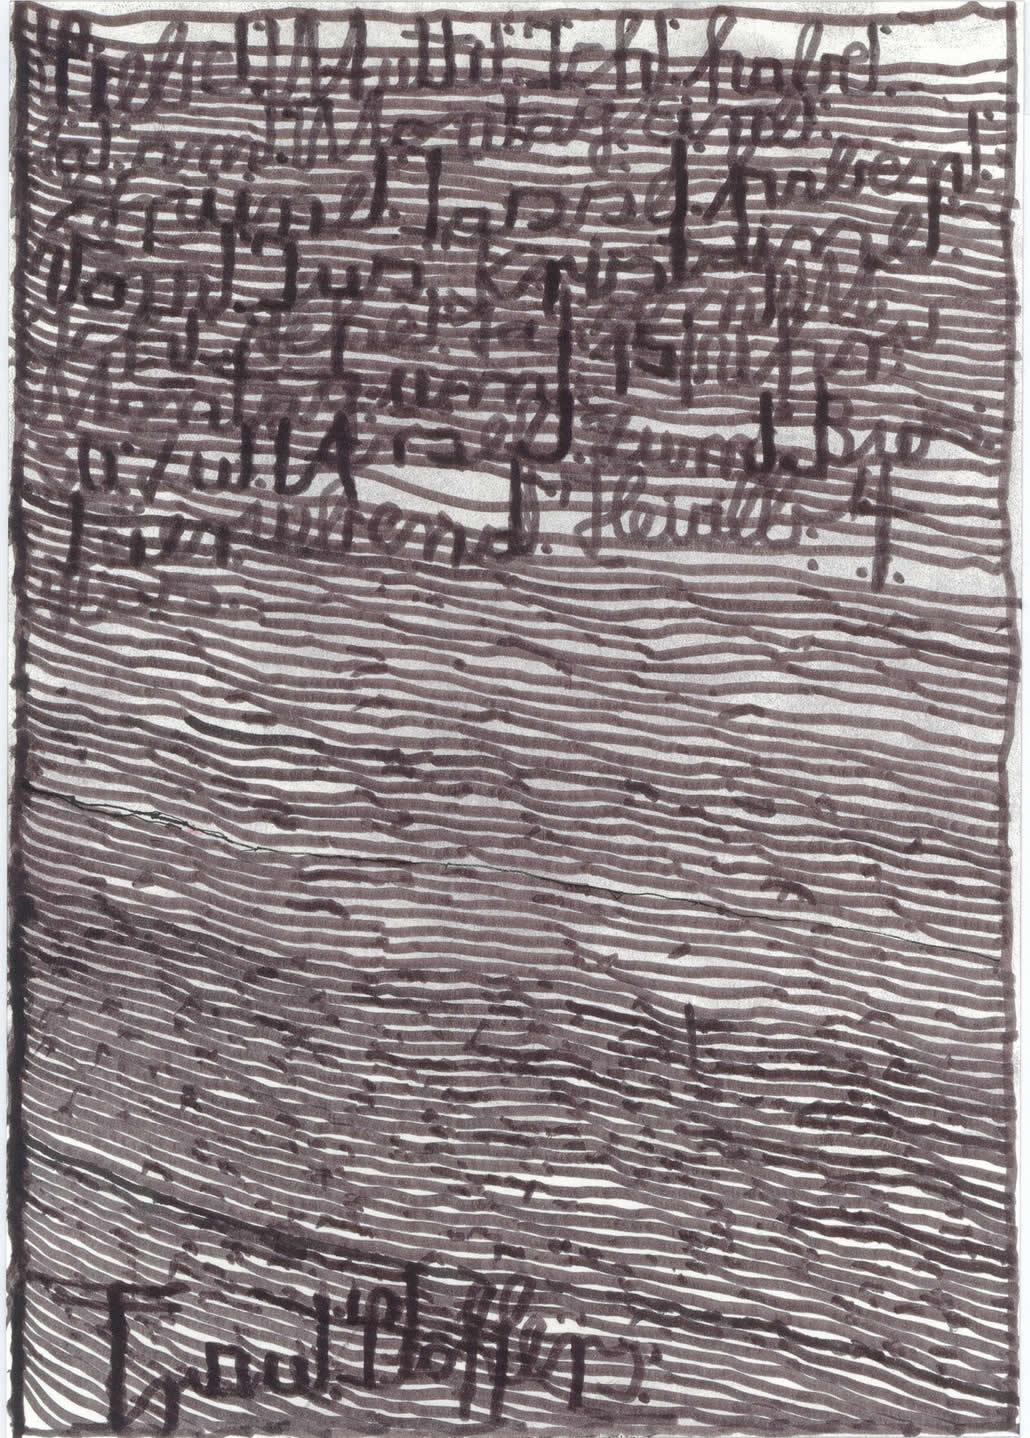 Harald Stoffers | Brief300 2014 | 29,5x21cm | viennacontemporary | Galerie3